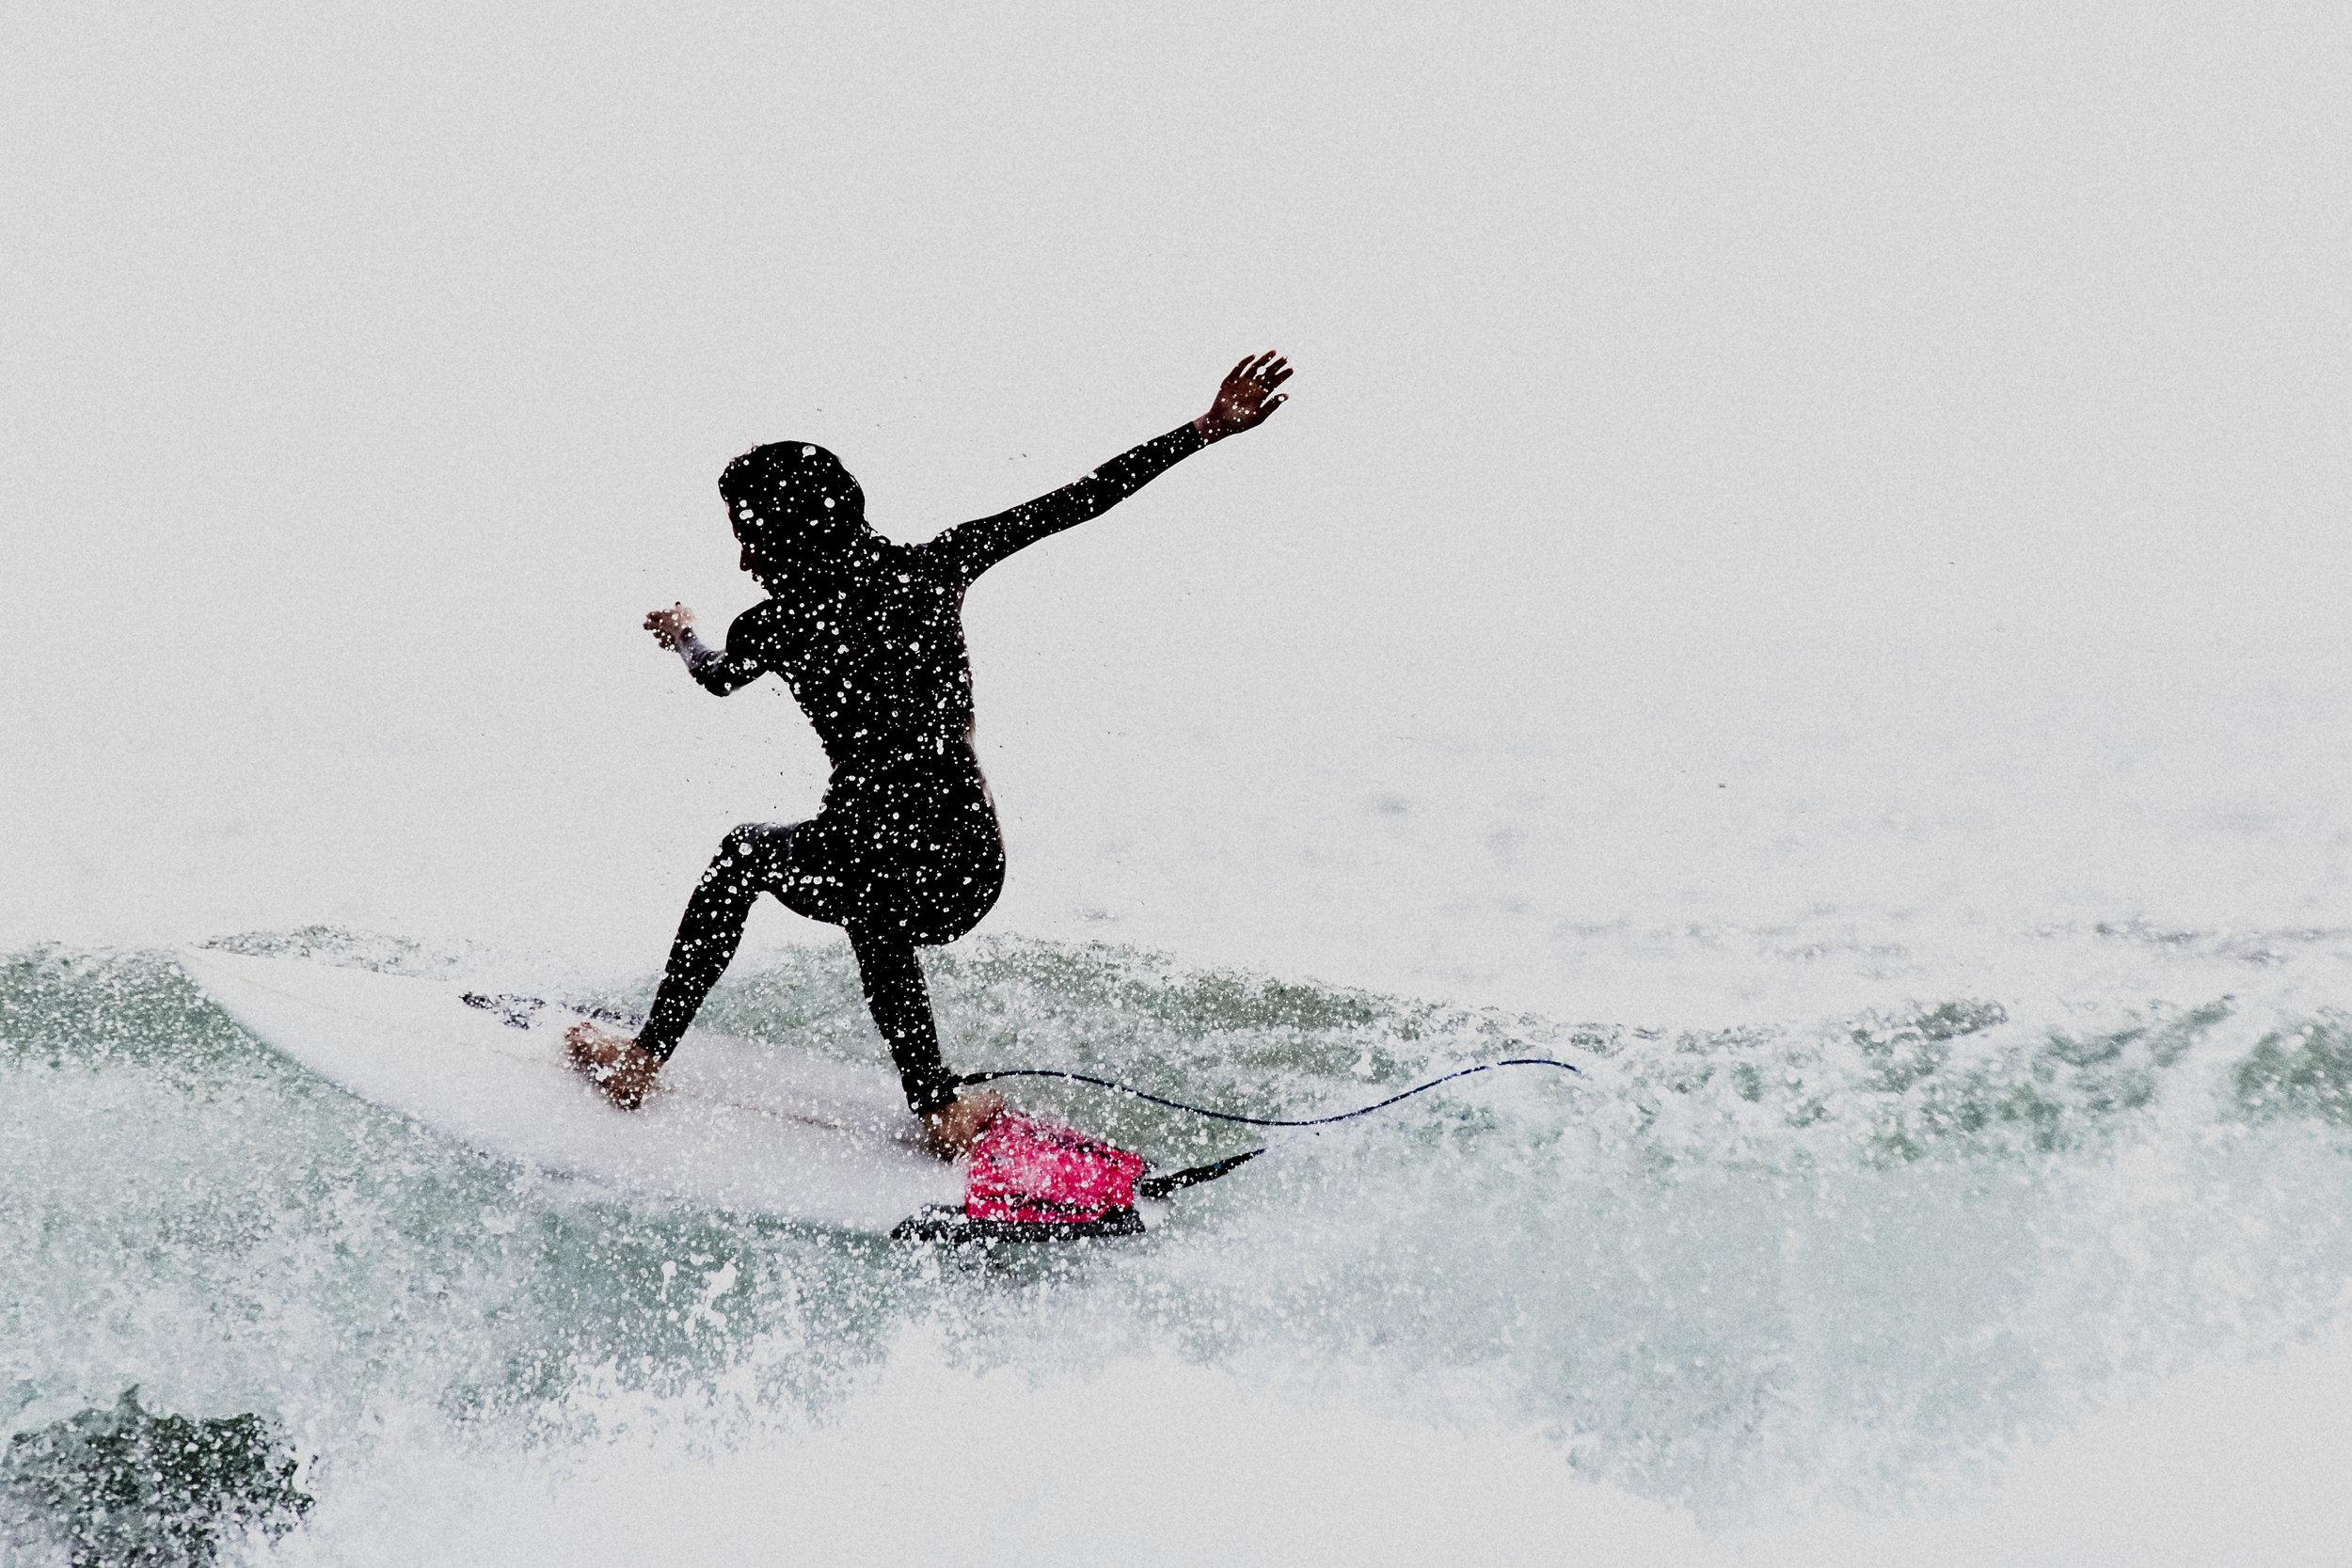 Surfing_PCH_490.jpg